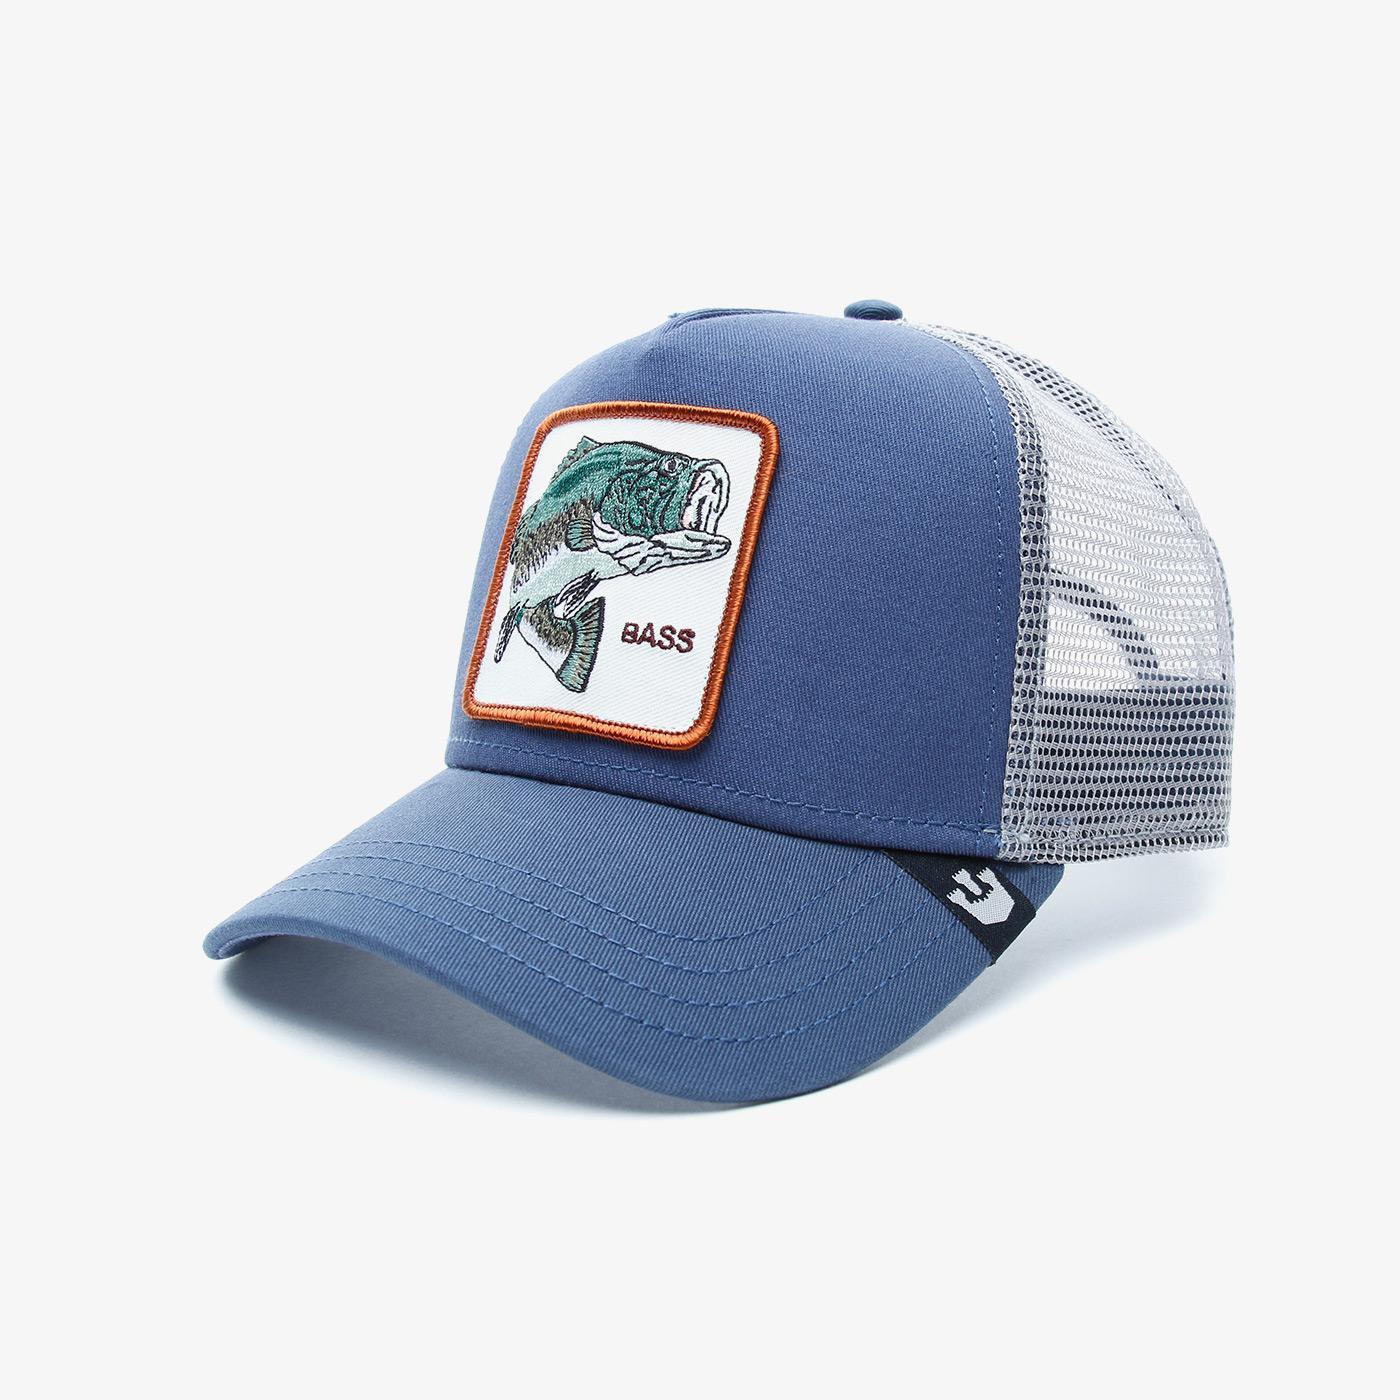 Goorin Bros Bad Ass Unisex Mavi Şapka